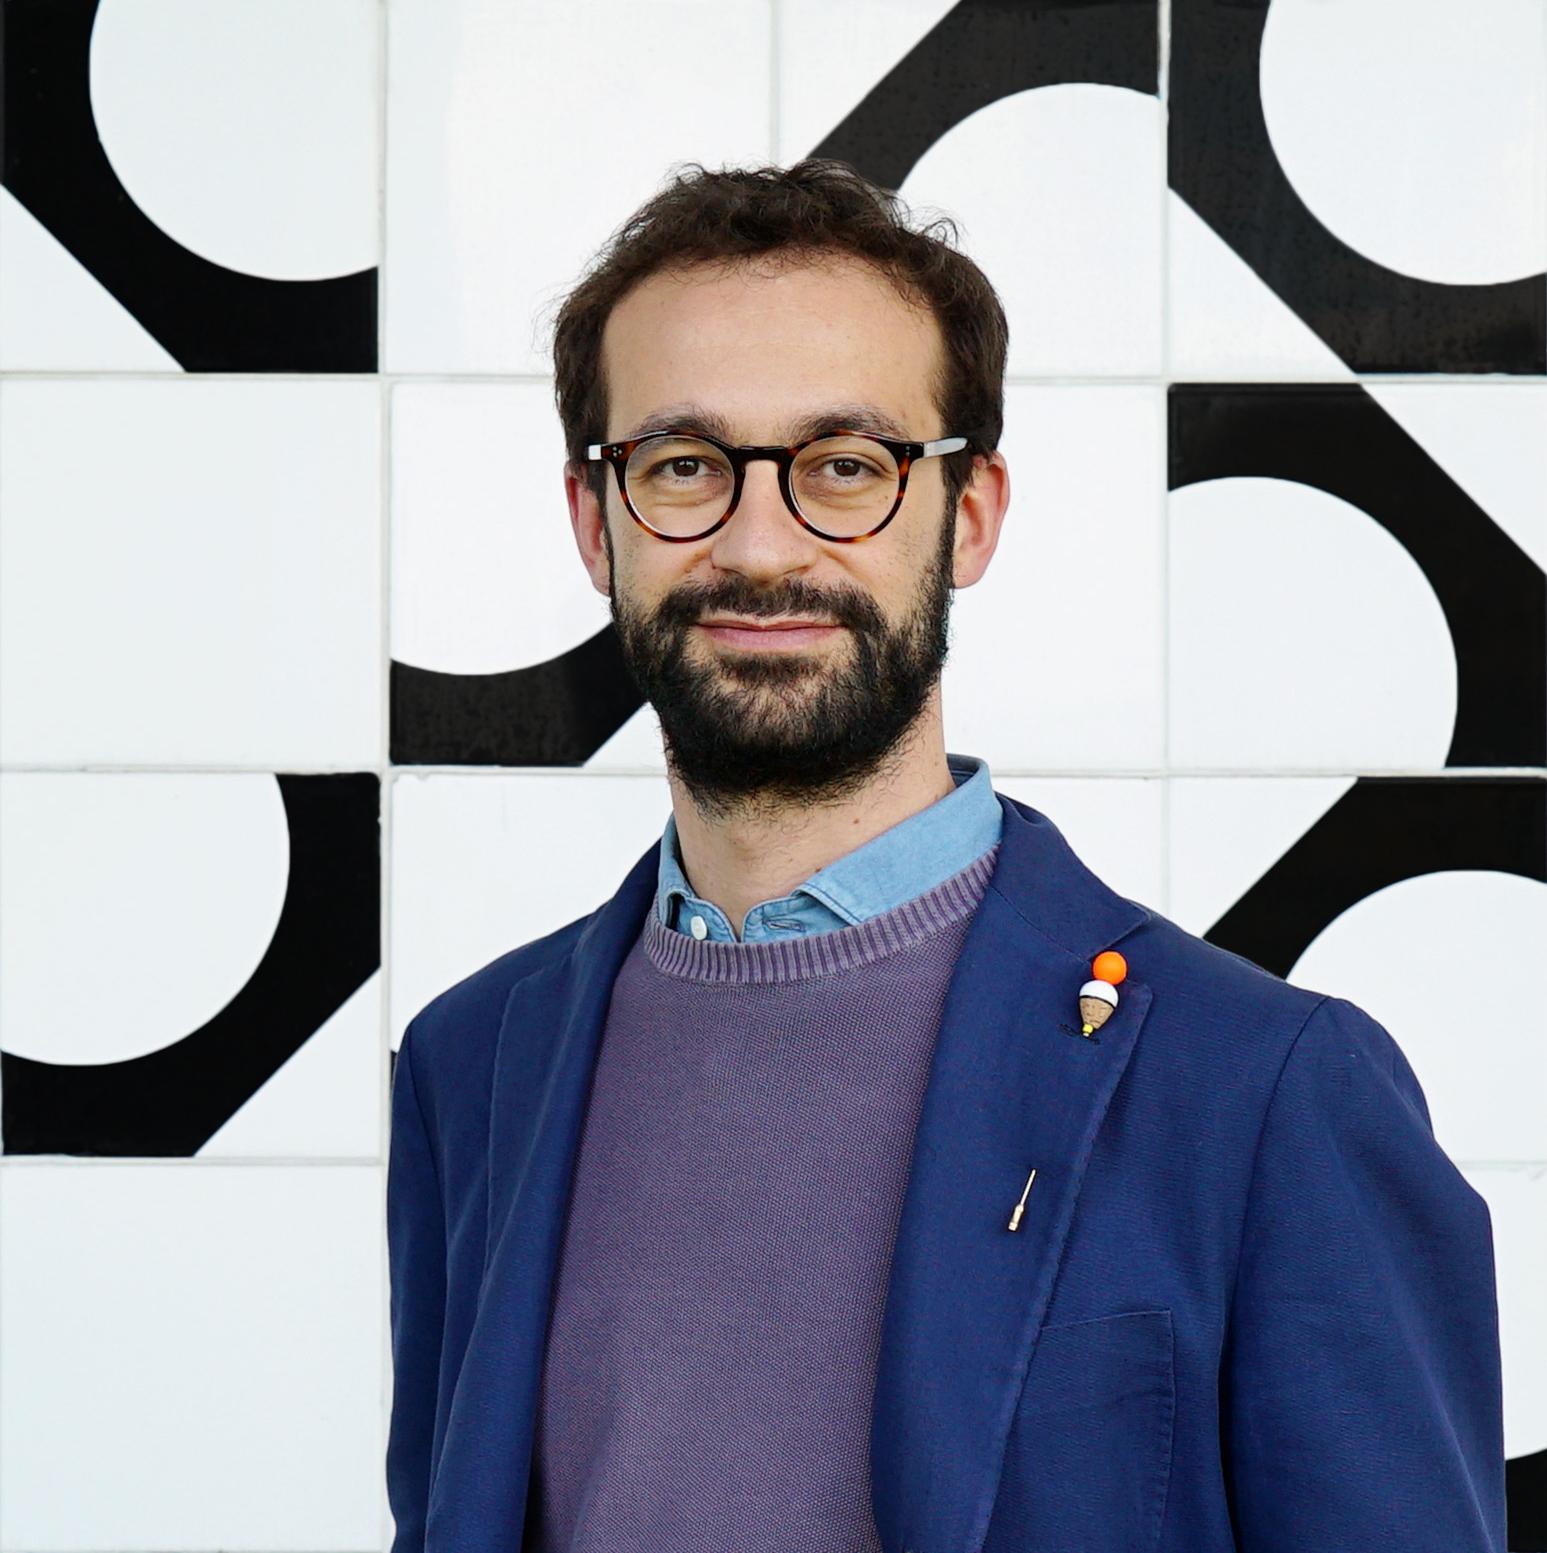 Luca Pitoni